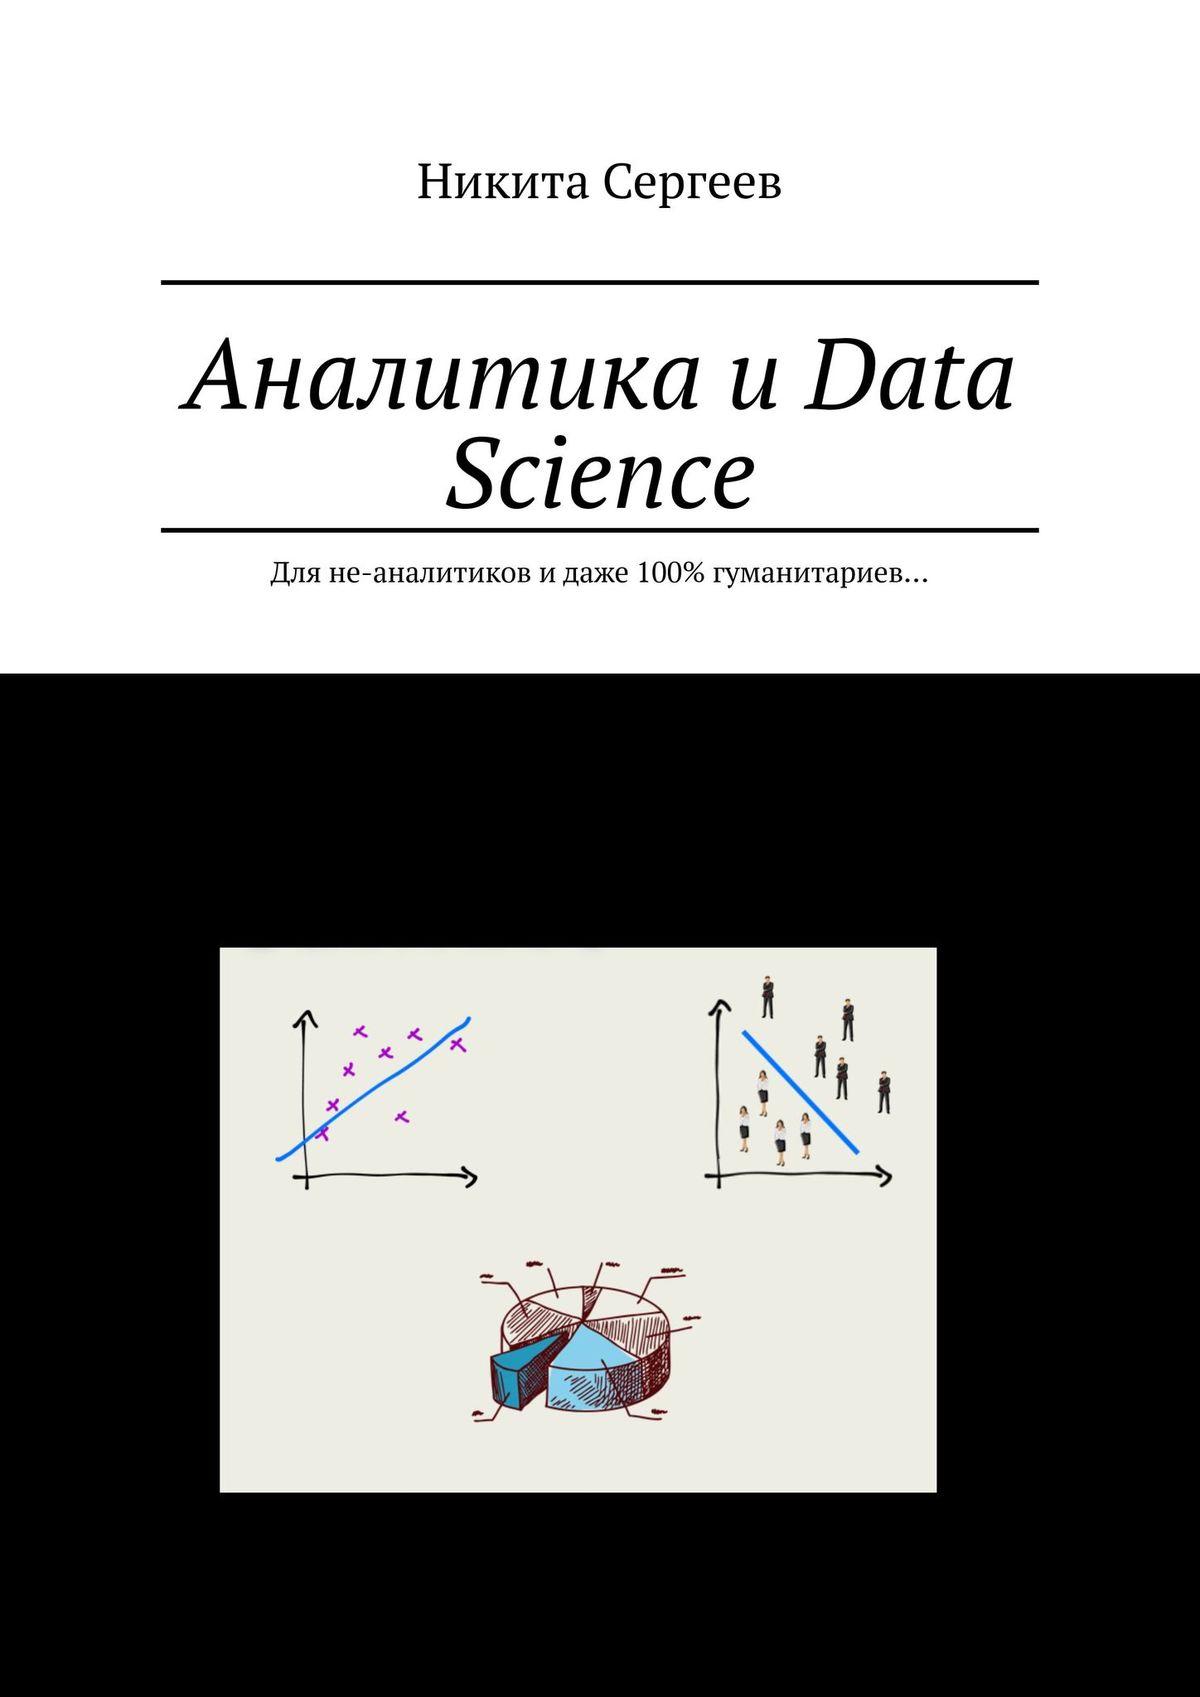 Обложка книги Аналитика иData Science. Для не-аналитиков идаже 100%гуманитариев…